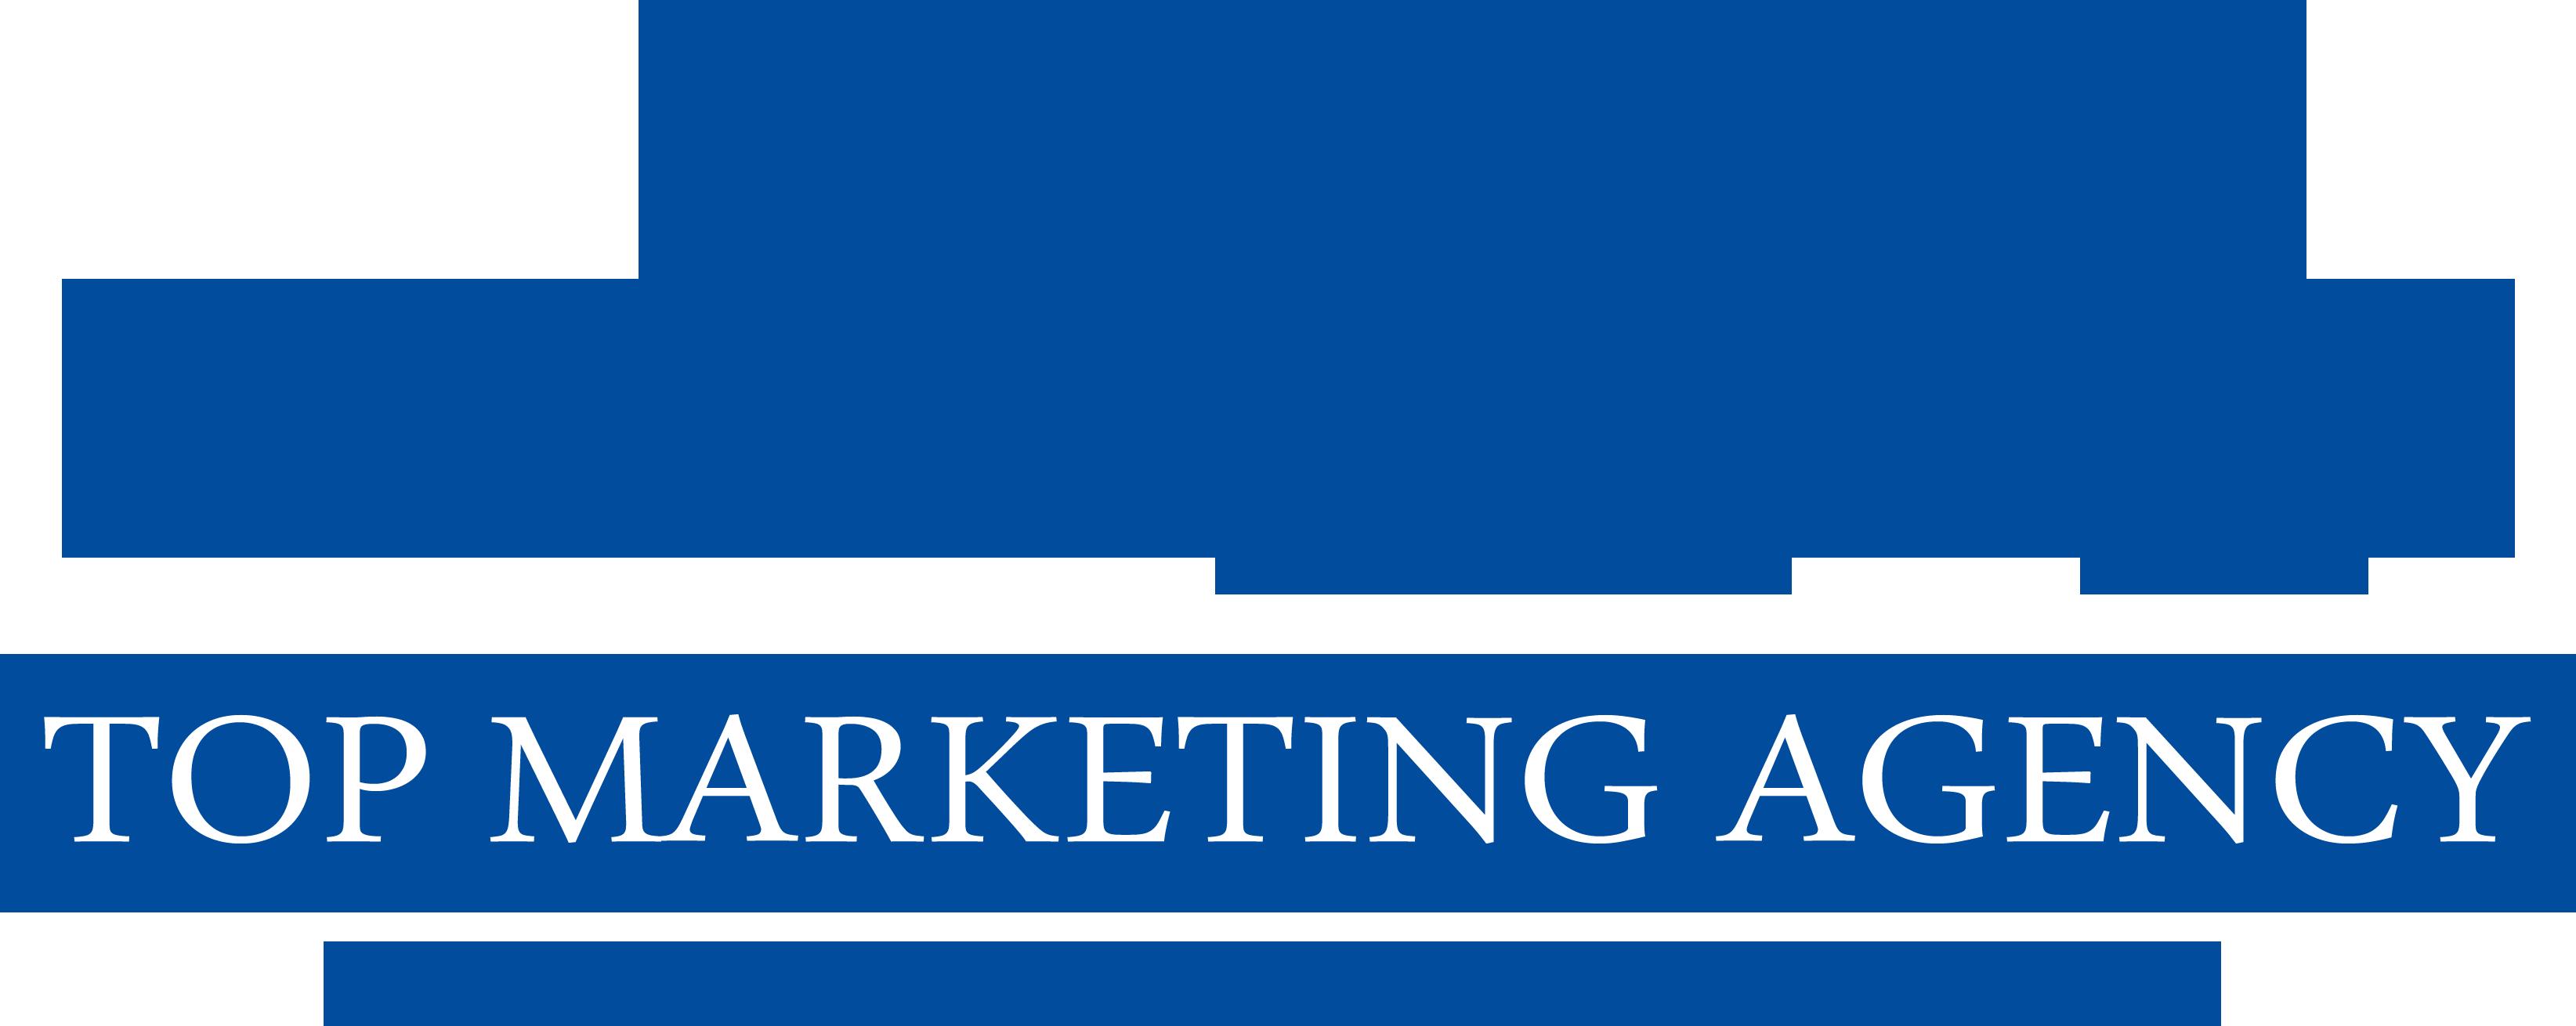 Top Marketing Agency Inc.